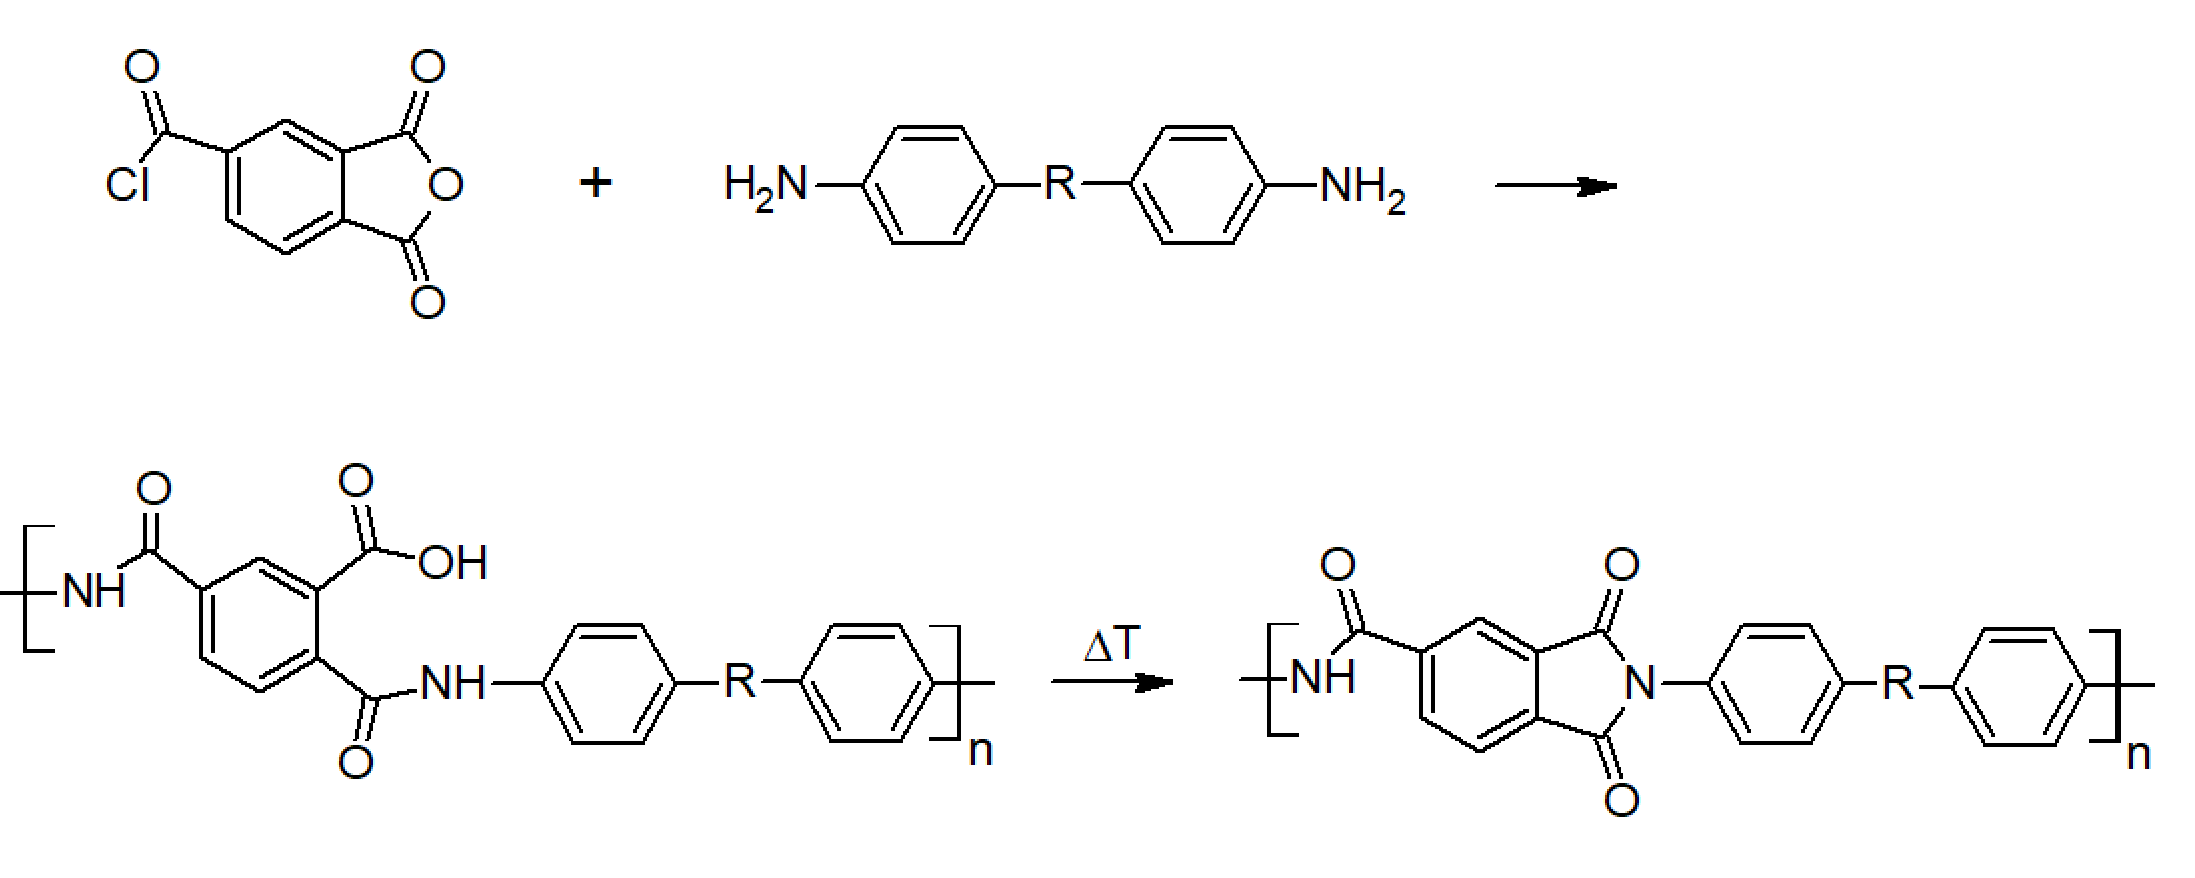 Properties of Polyamideimide